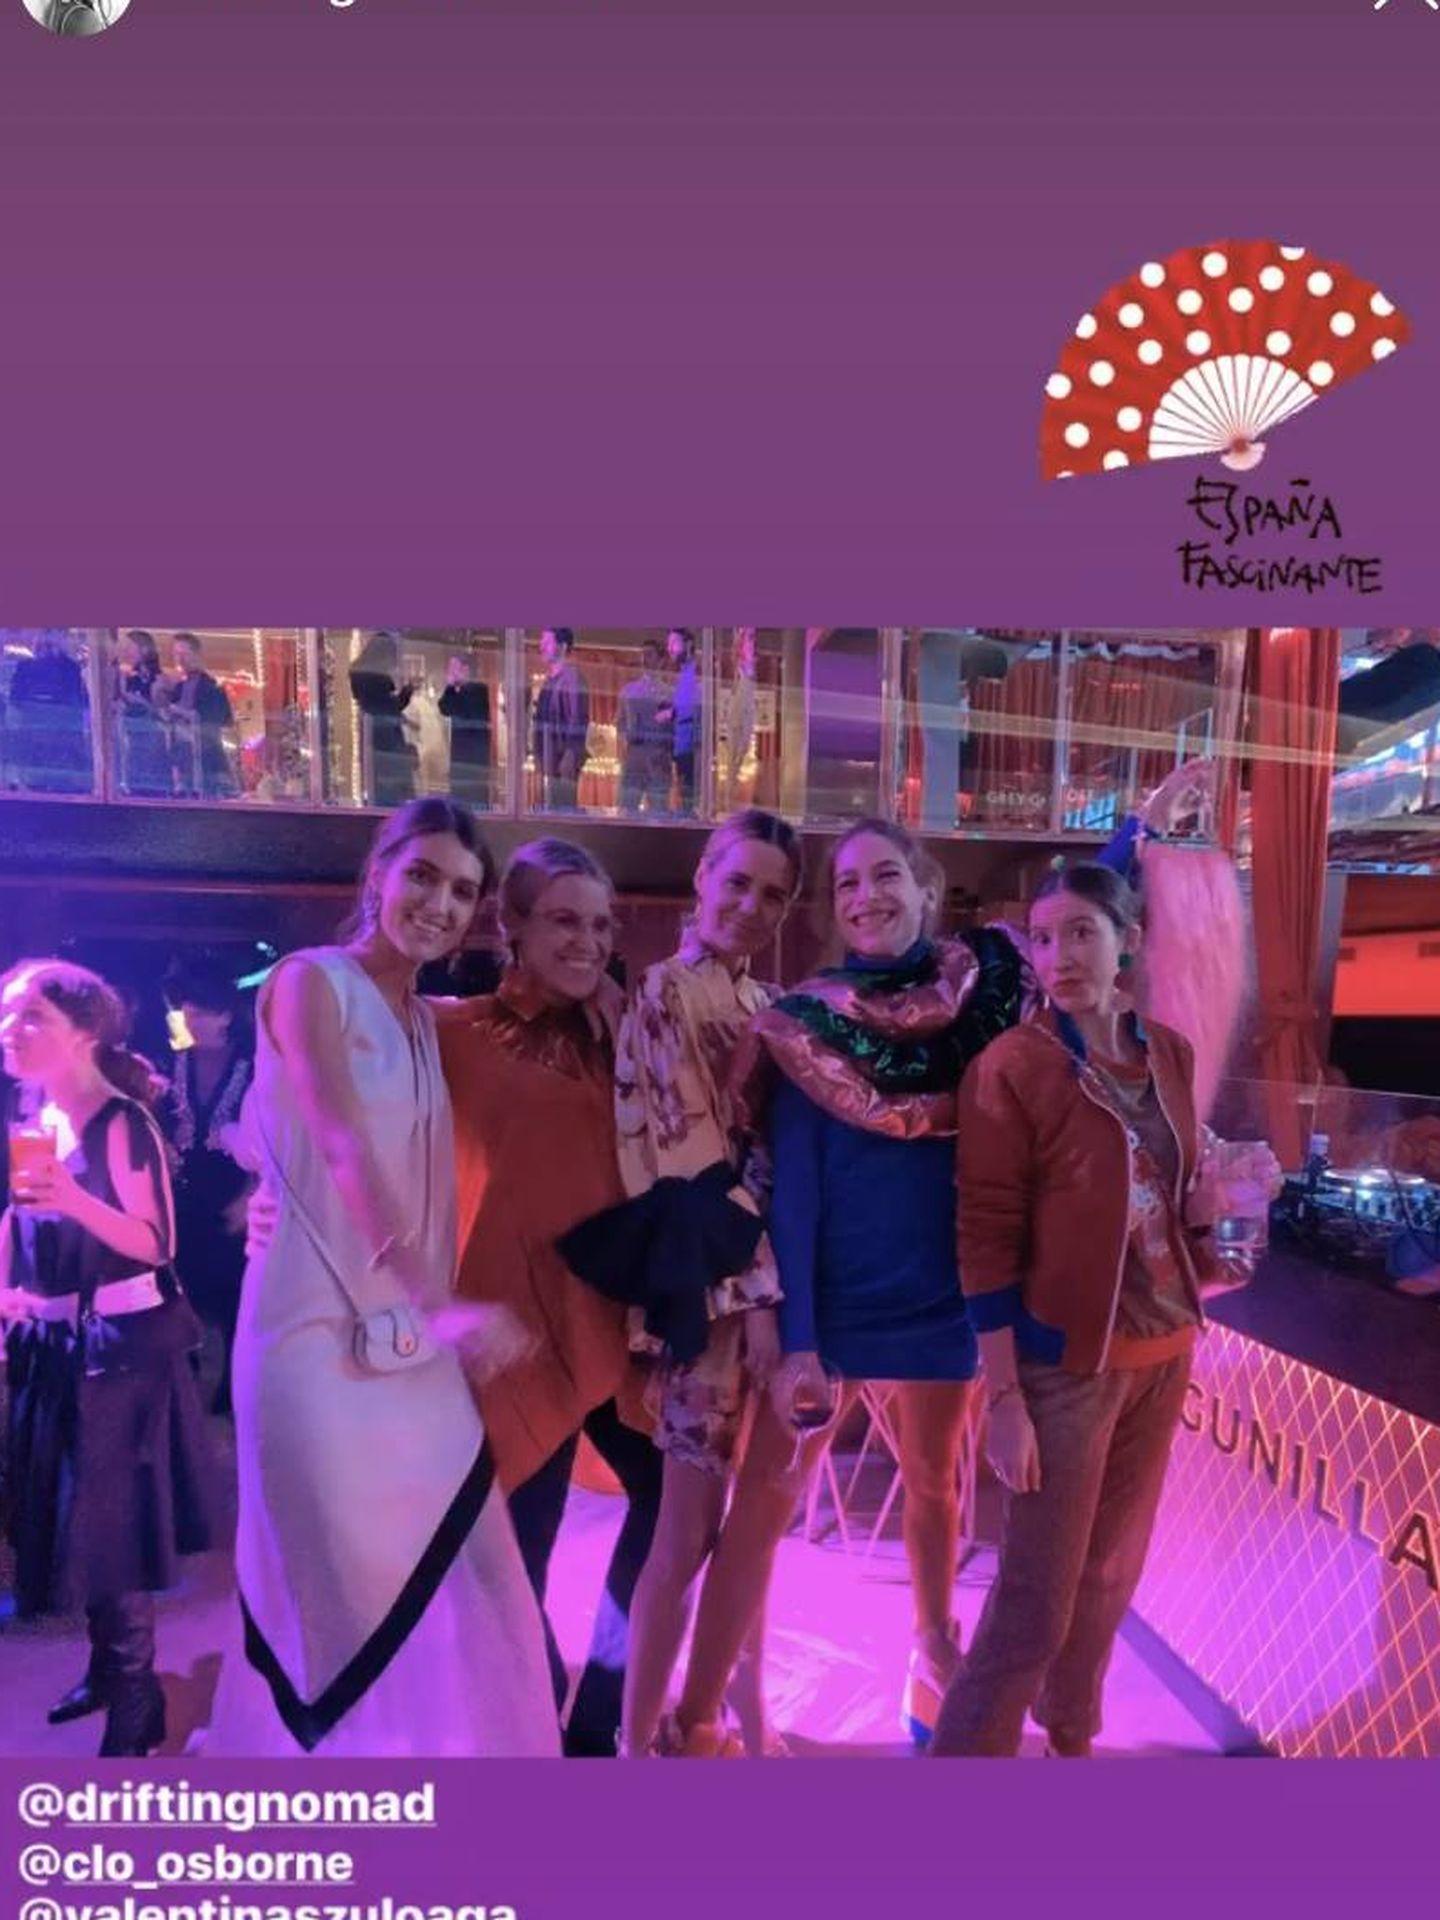 Valentina, Francesca, Claudia Osborne y Cósima, en la fiesta. (@driftingnomad)